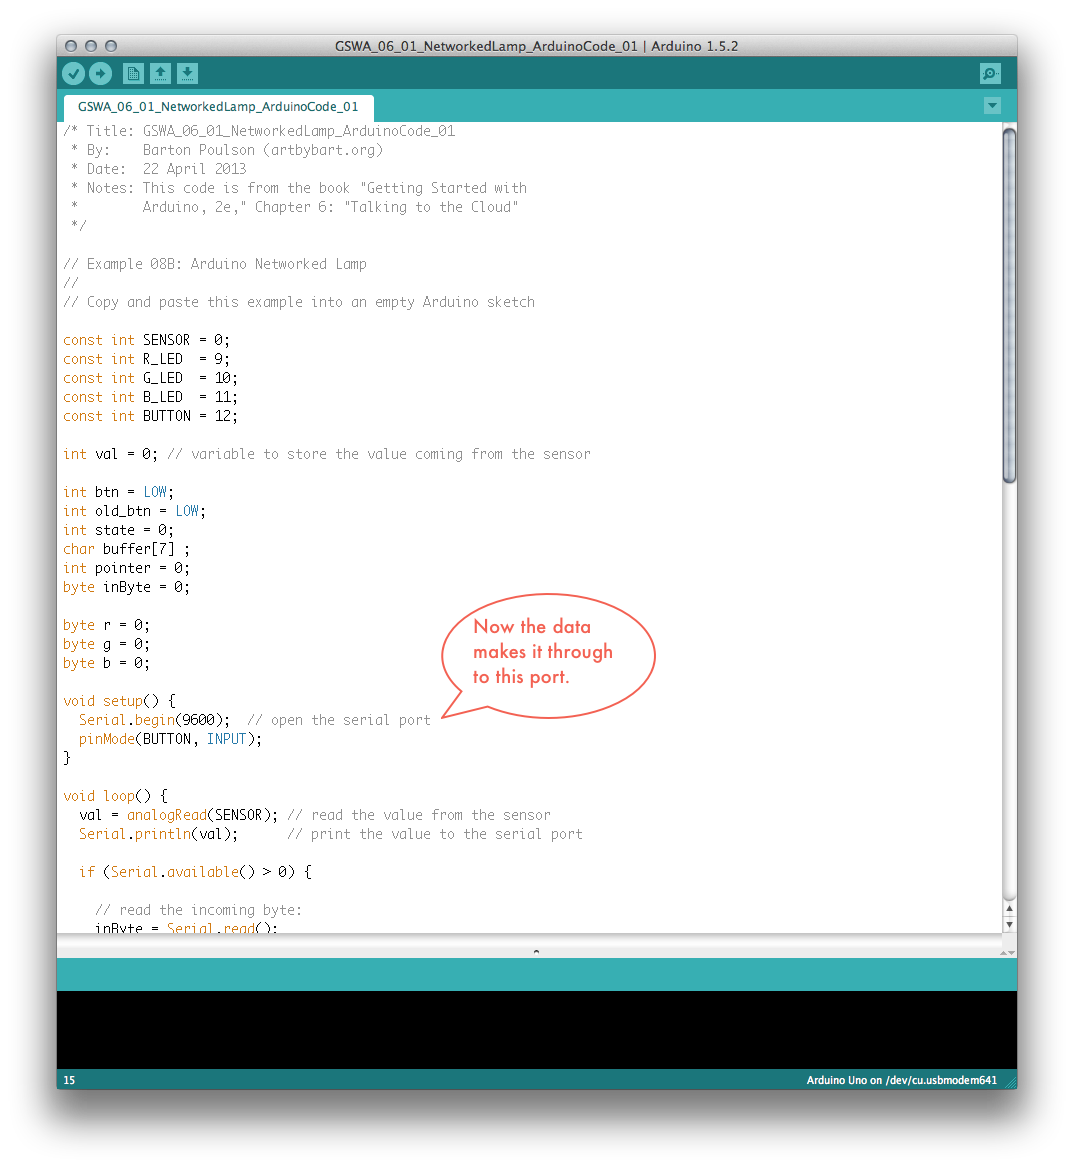 gswa_06_01f_networkedlamp_arduinocode.png